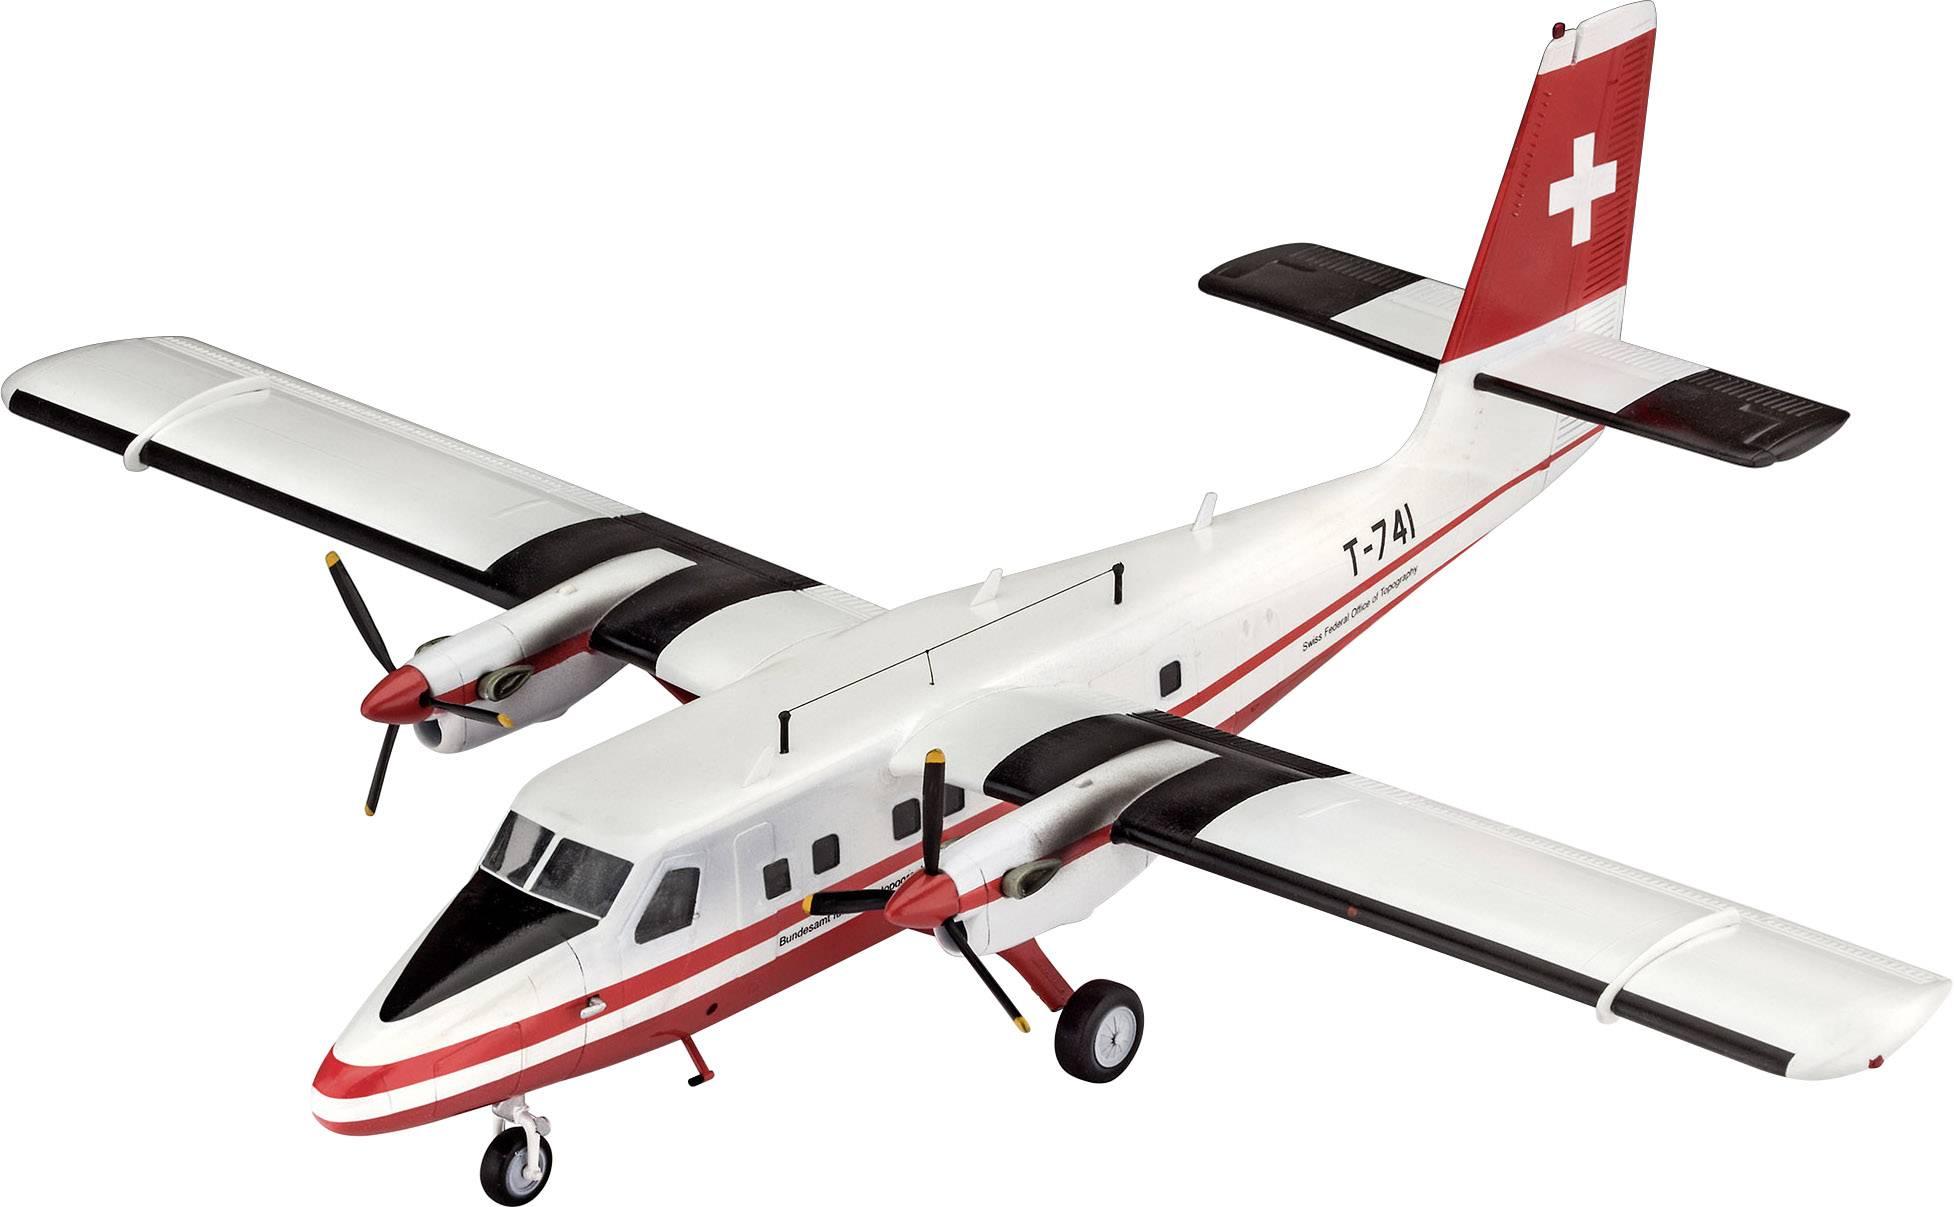 Model letadla, stavebnice Revell 03954 DHC-6 Twinn Otter Swisstopo DHC-6 Twinn Otter Swisstopo 1:72